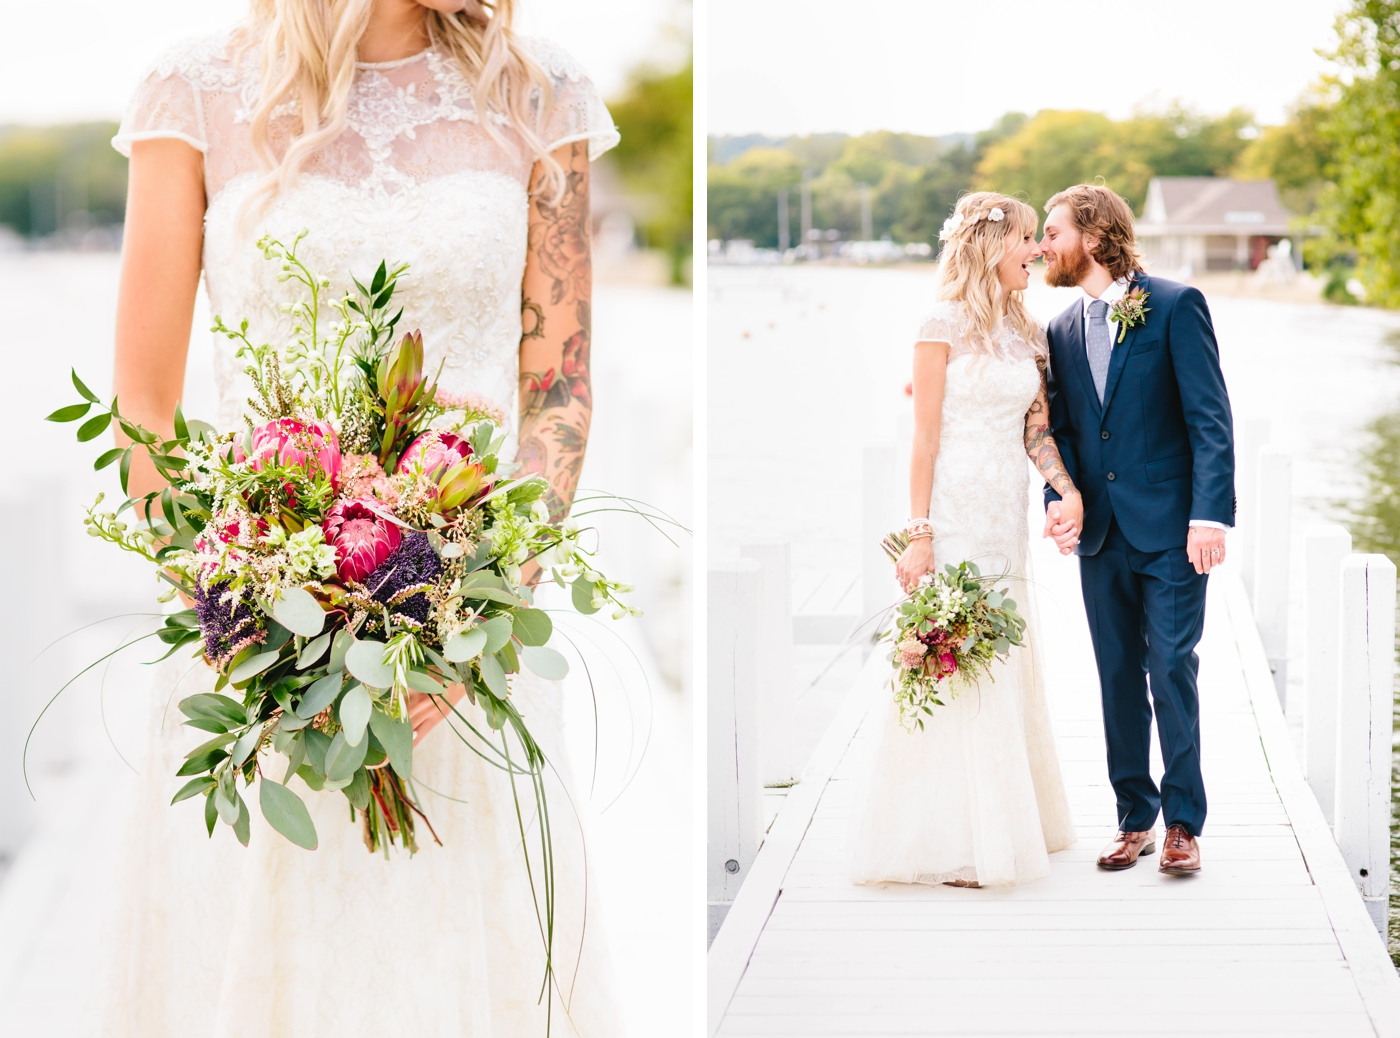 chicago-fine-art-wedding-photography-chriskelsey23